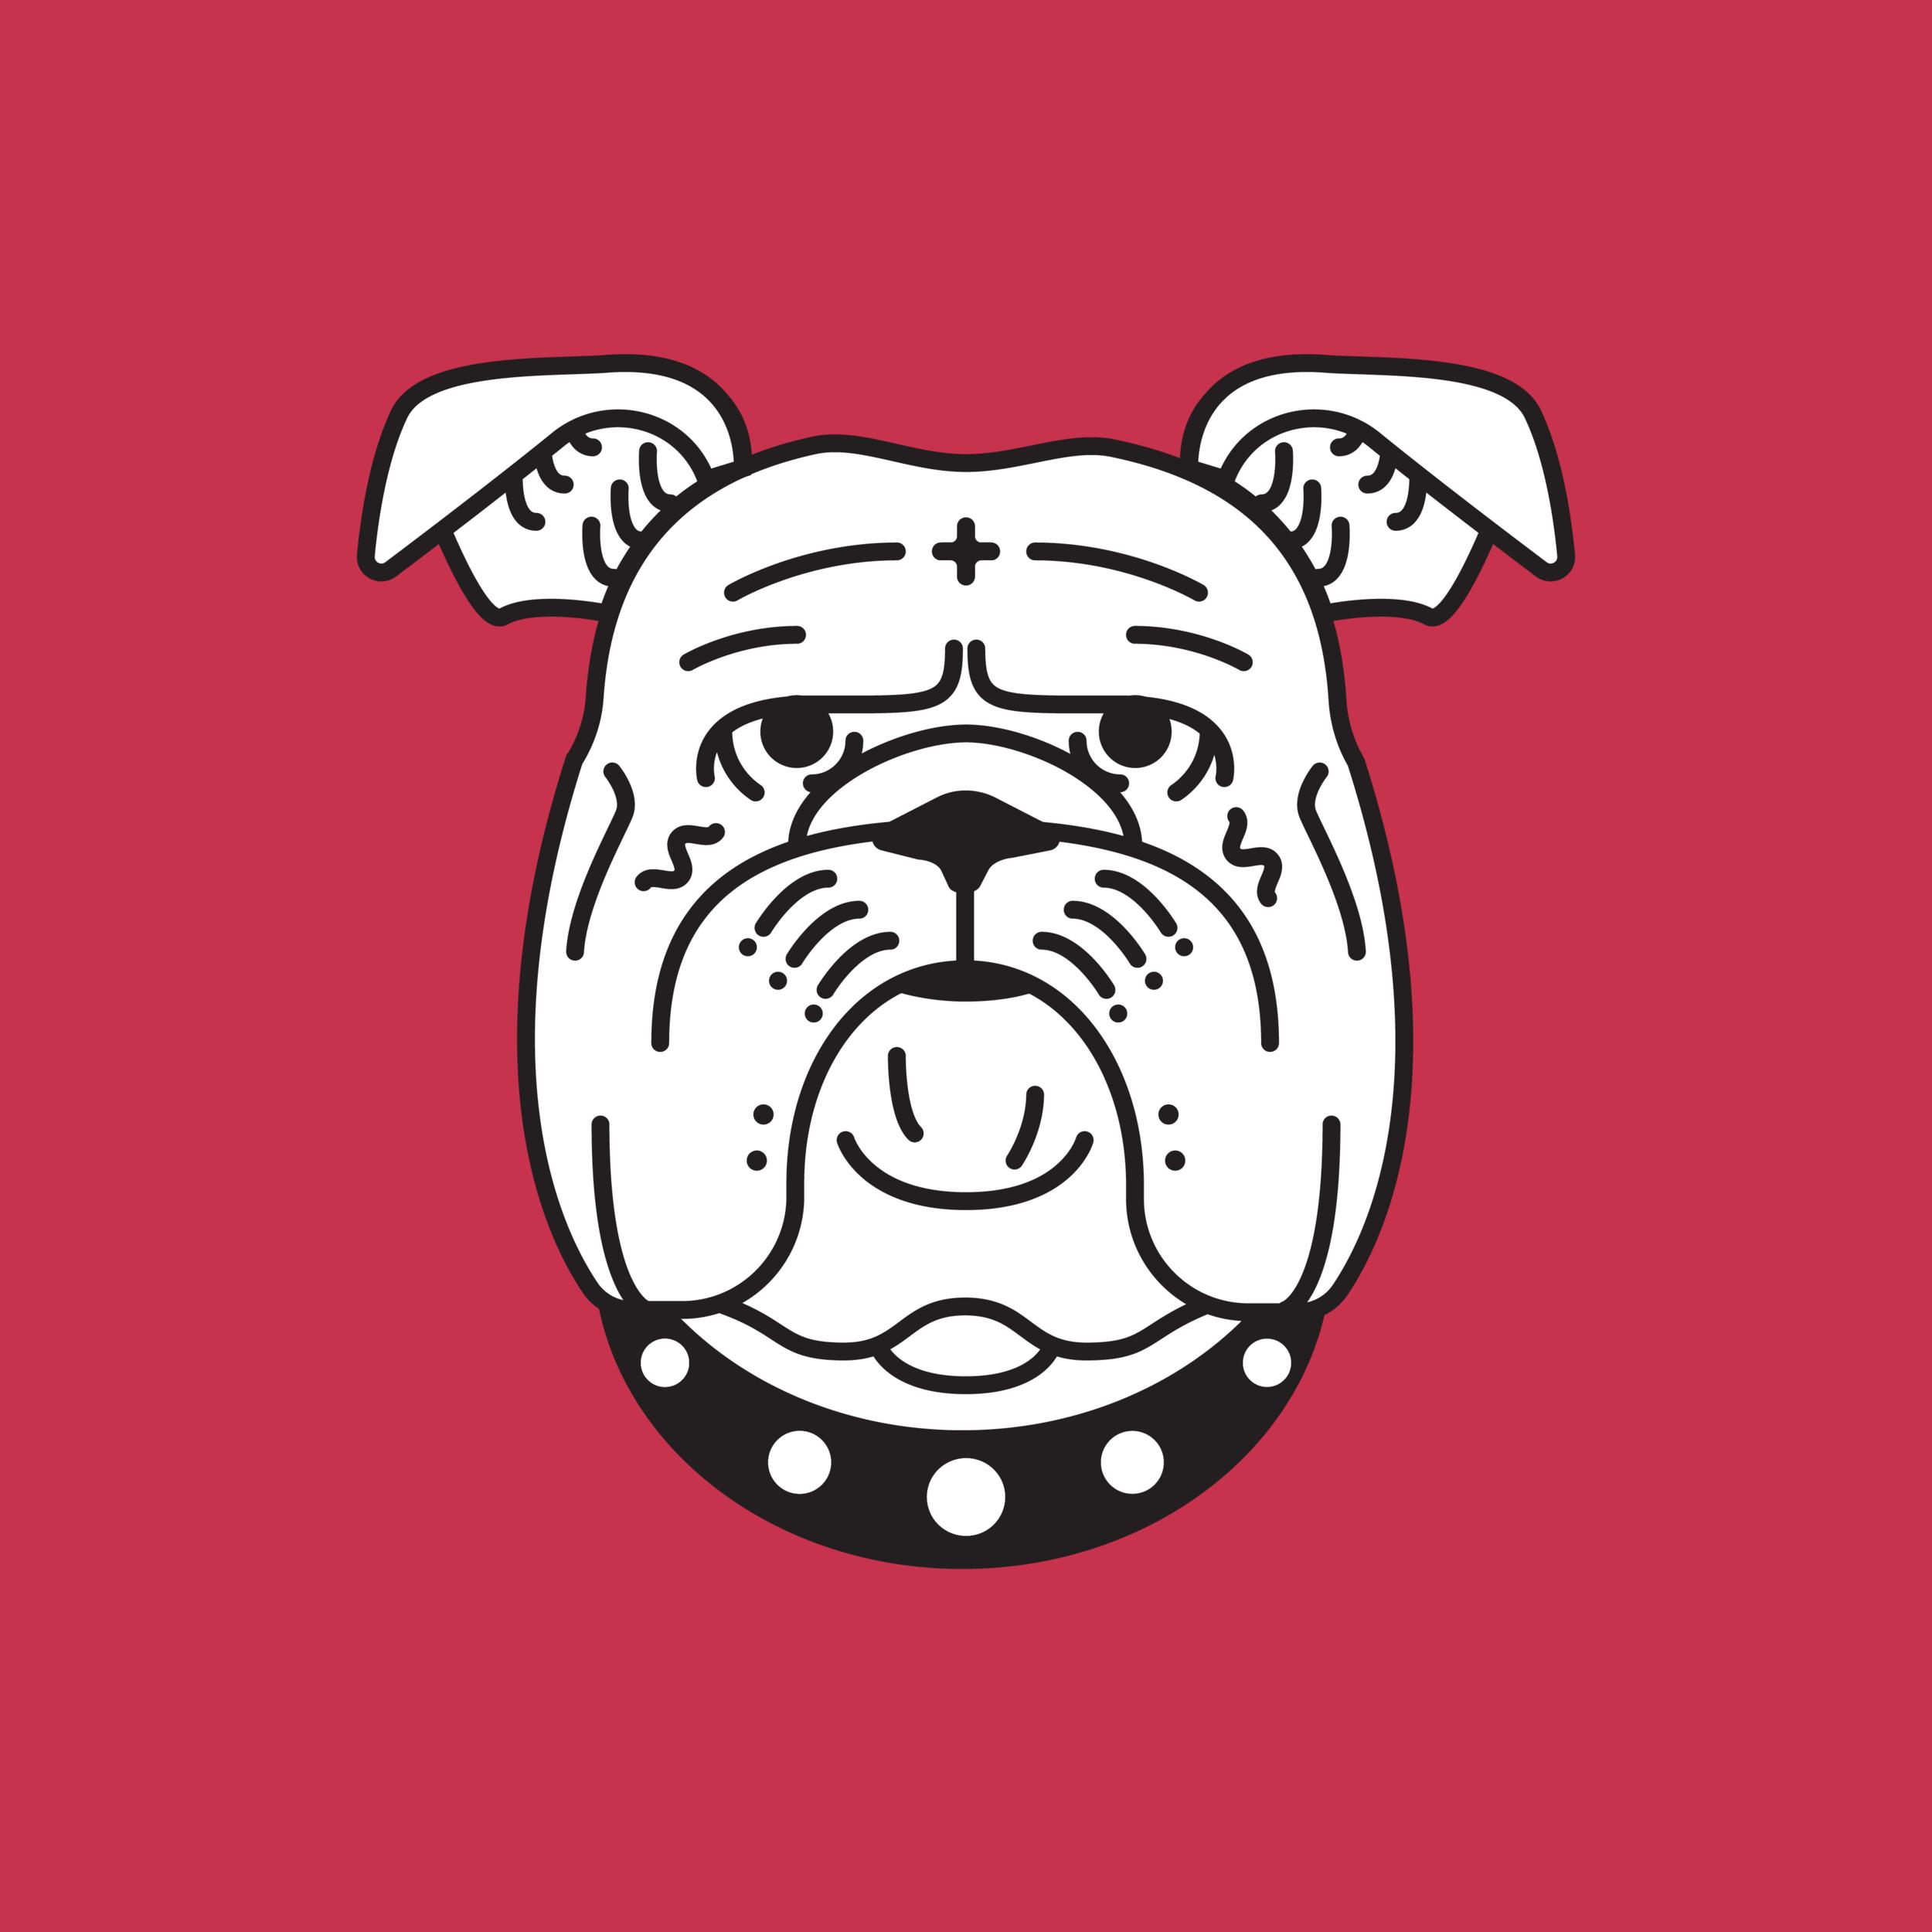 bulldog-01_TrevorYardleyJones.png